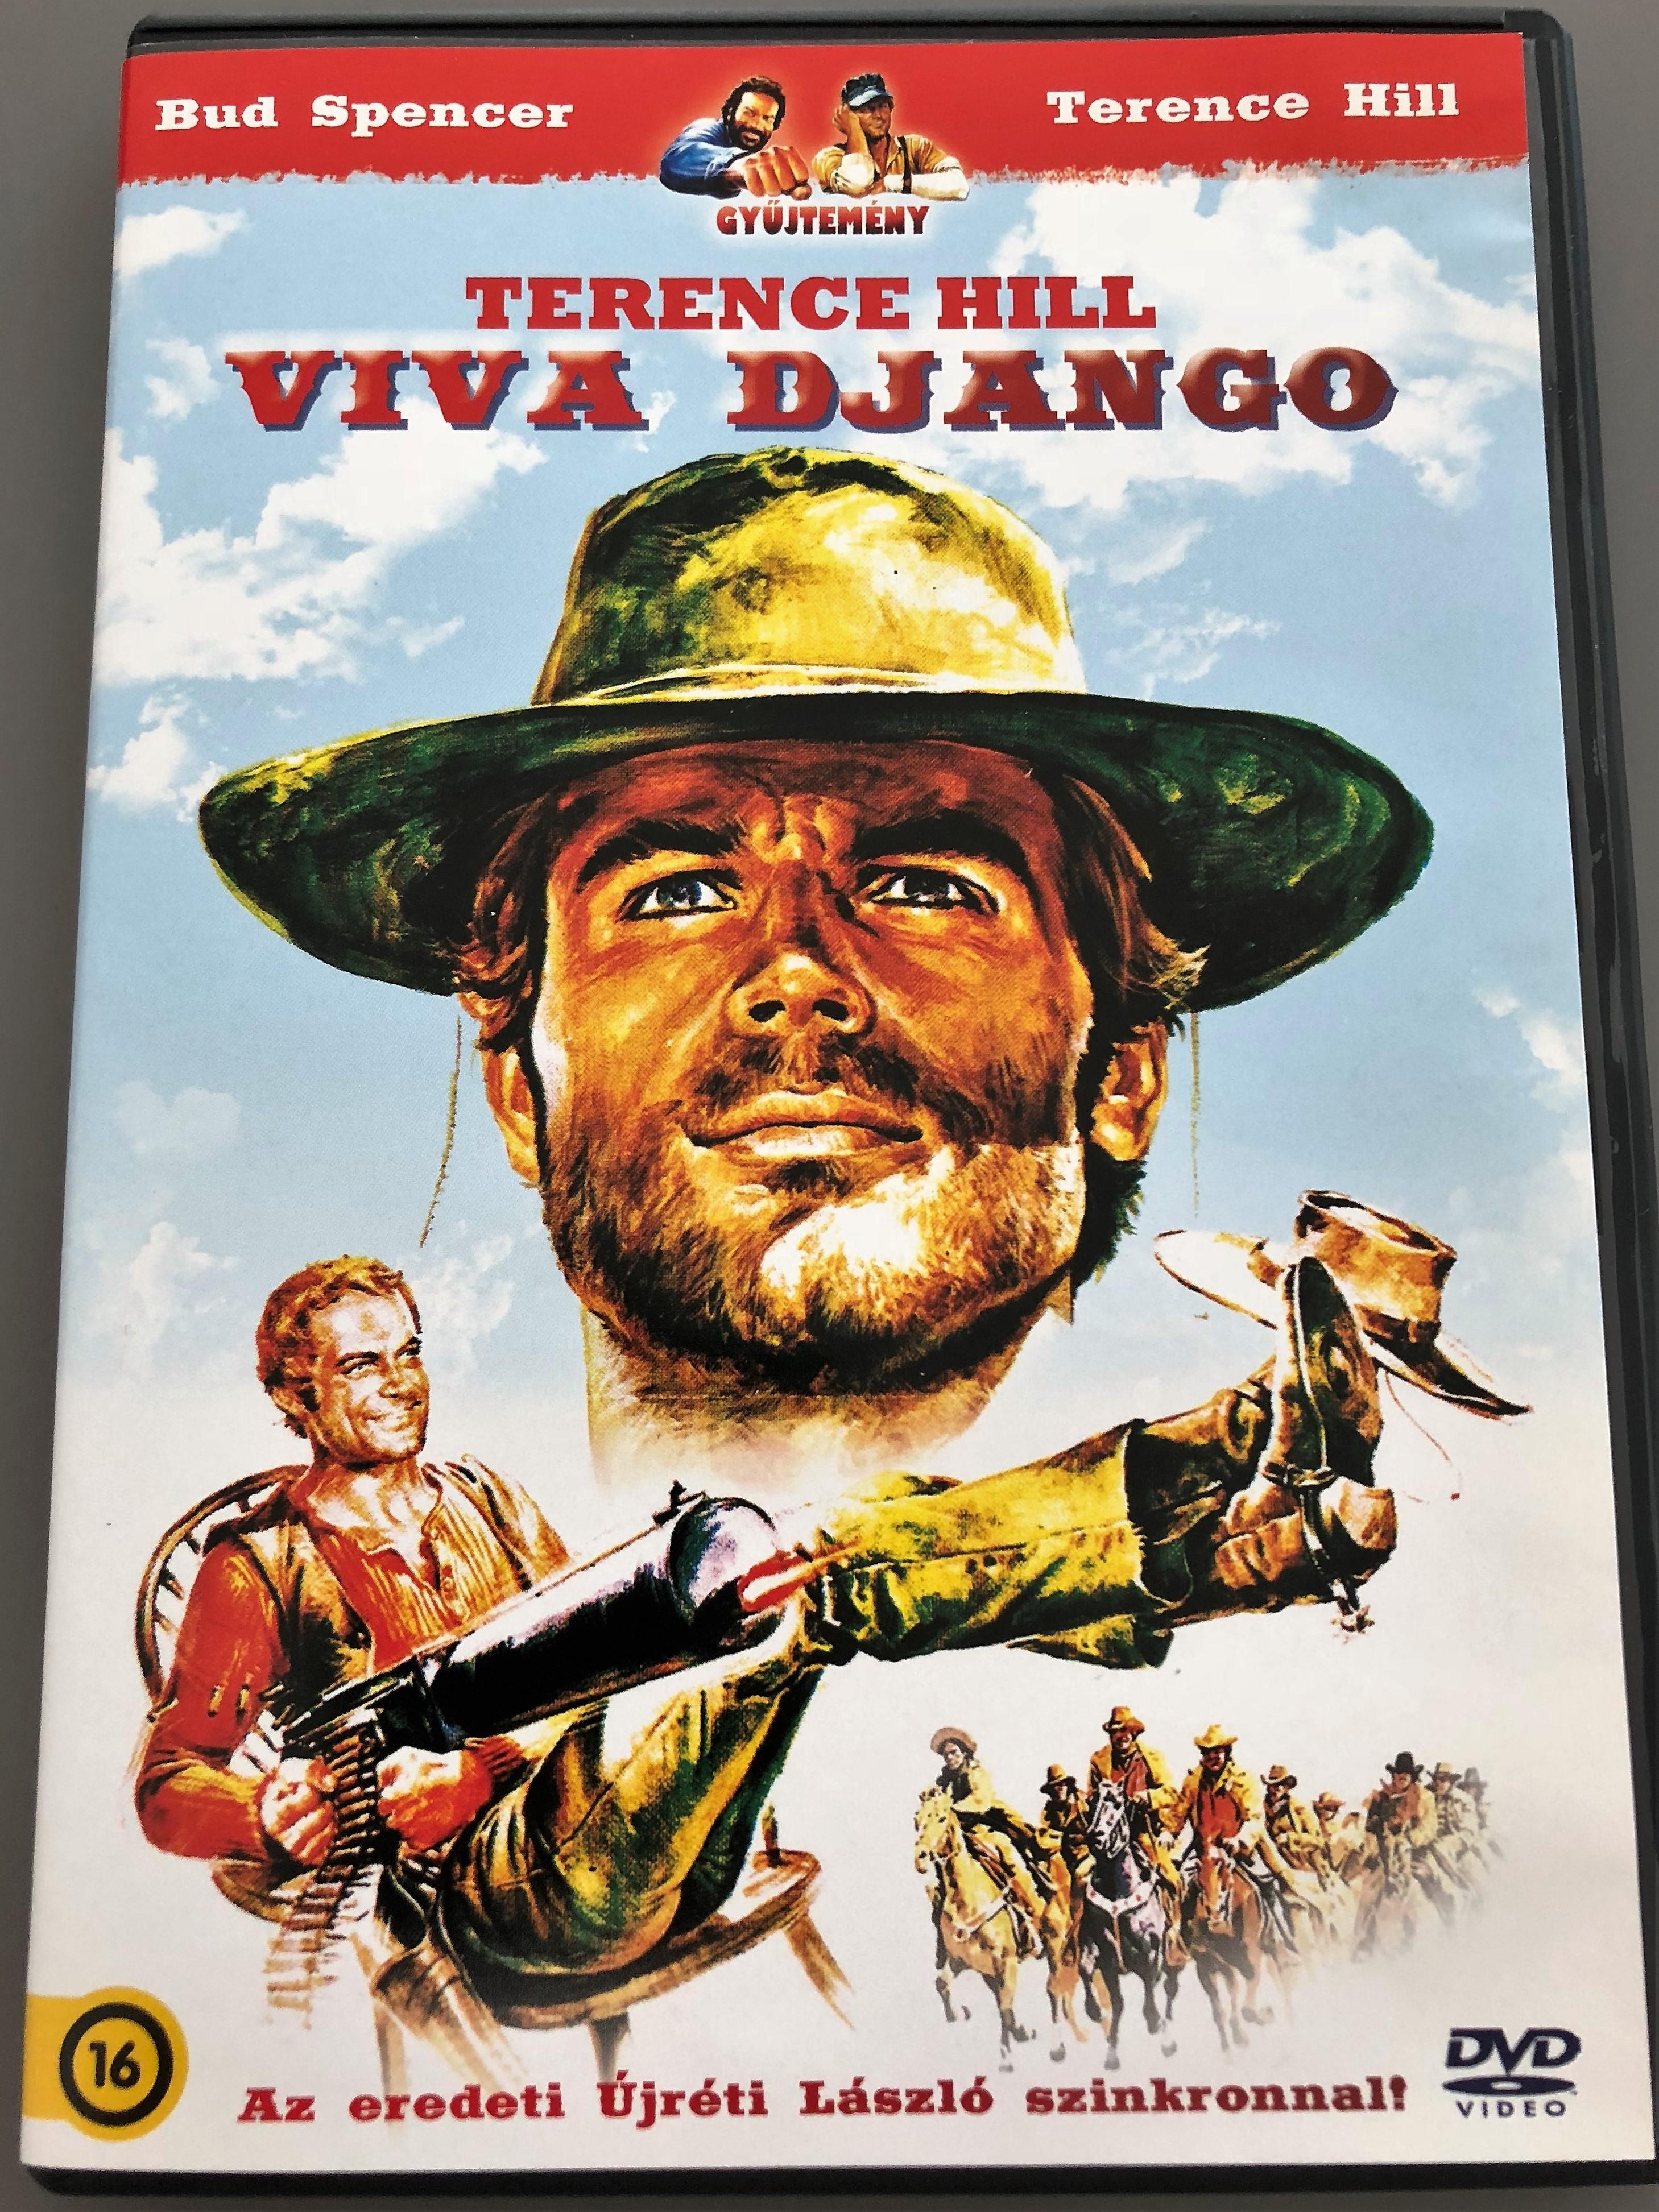 preparati-la-bara-dvd-1968-viva-django-django-prepare-a-coffin-directed-by-ferninando-baldi-starring-terence-hill-horst-frank-george-eastman-jos-torres-az-eredeti-jr-ti-l-szl-szinkronnal-bud-spencer-terence-1-.jpg